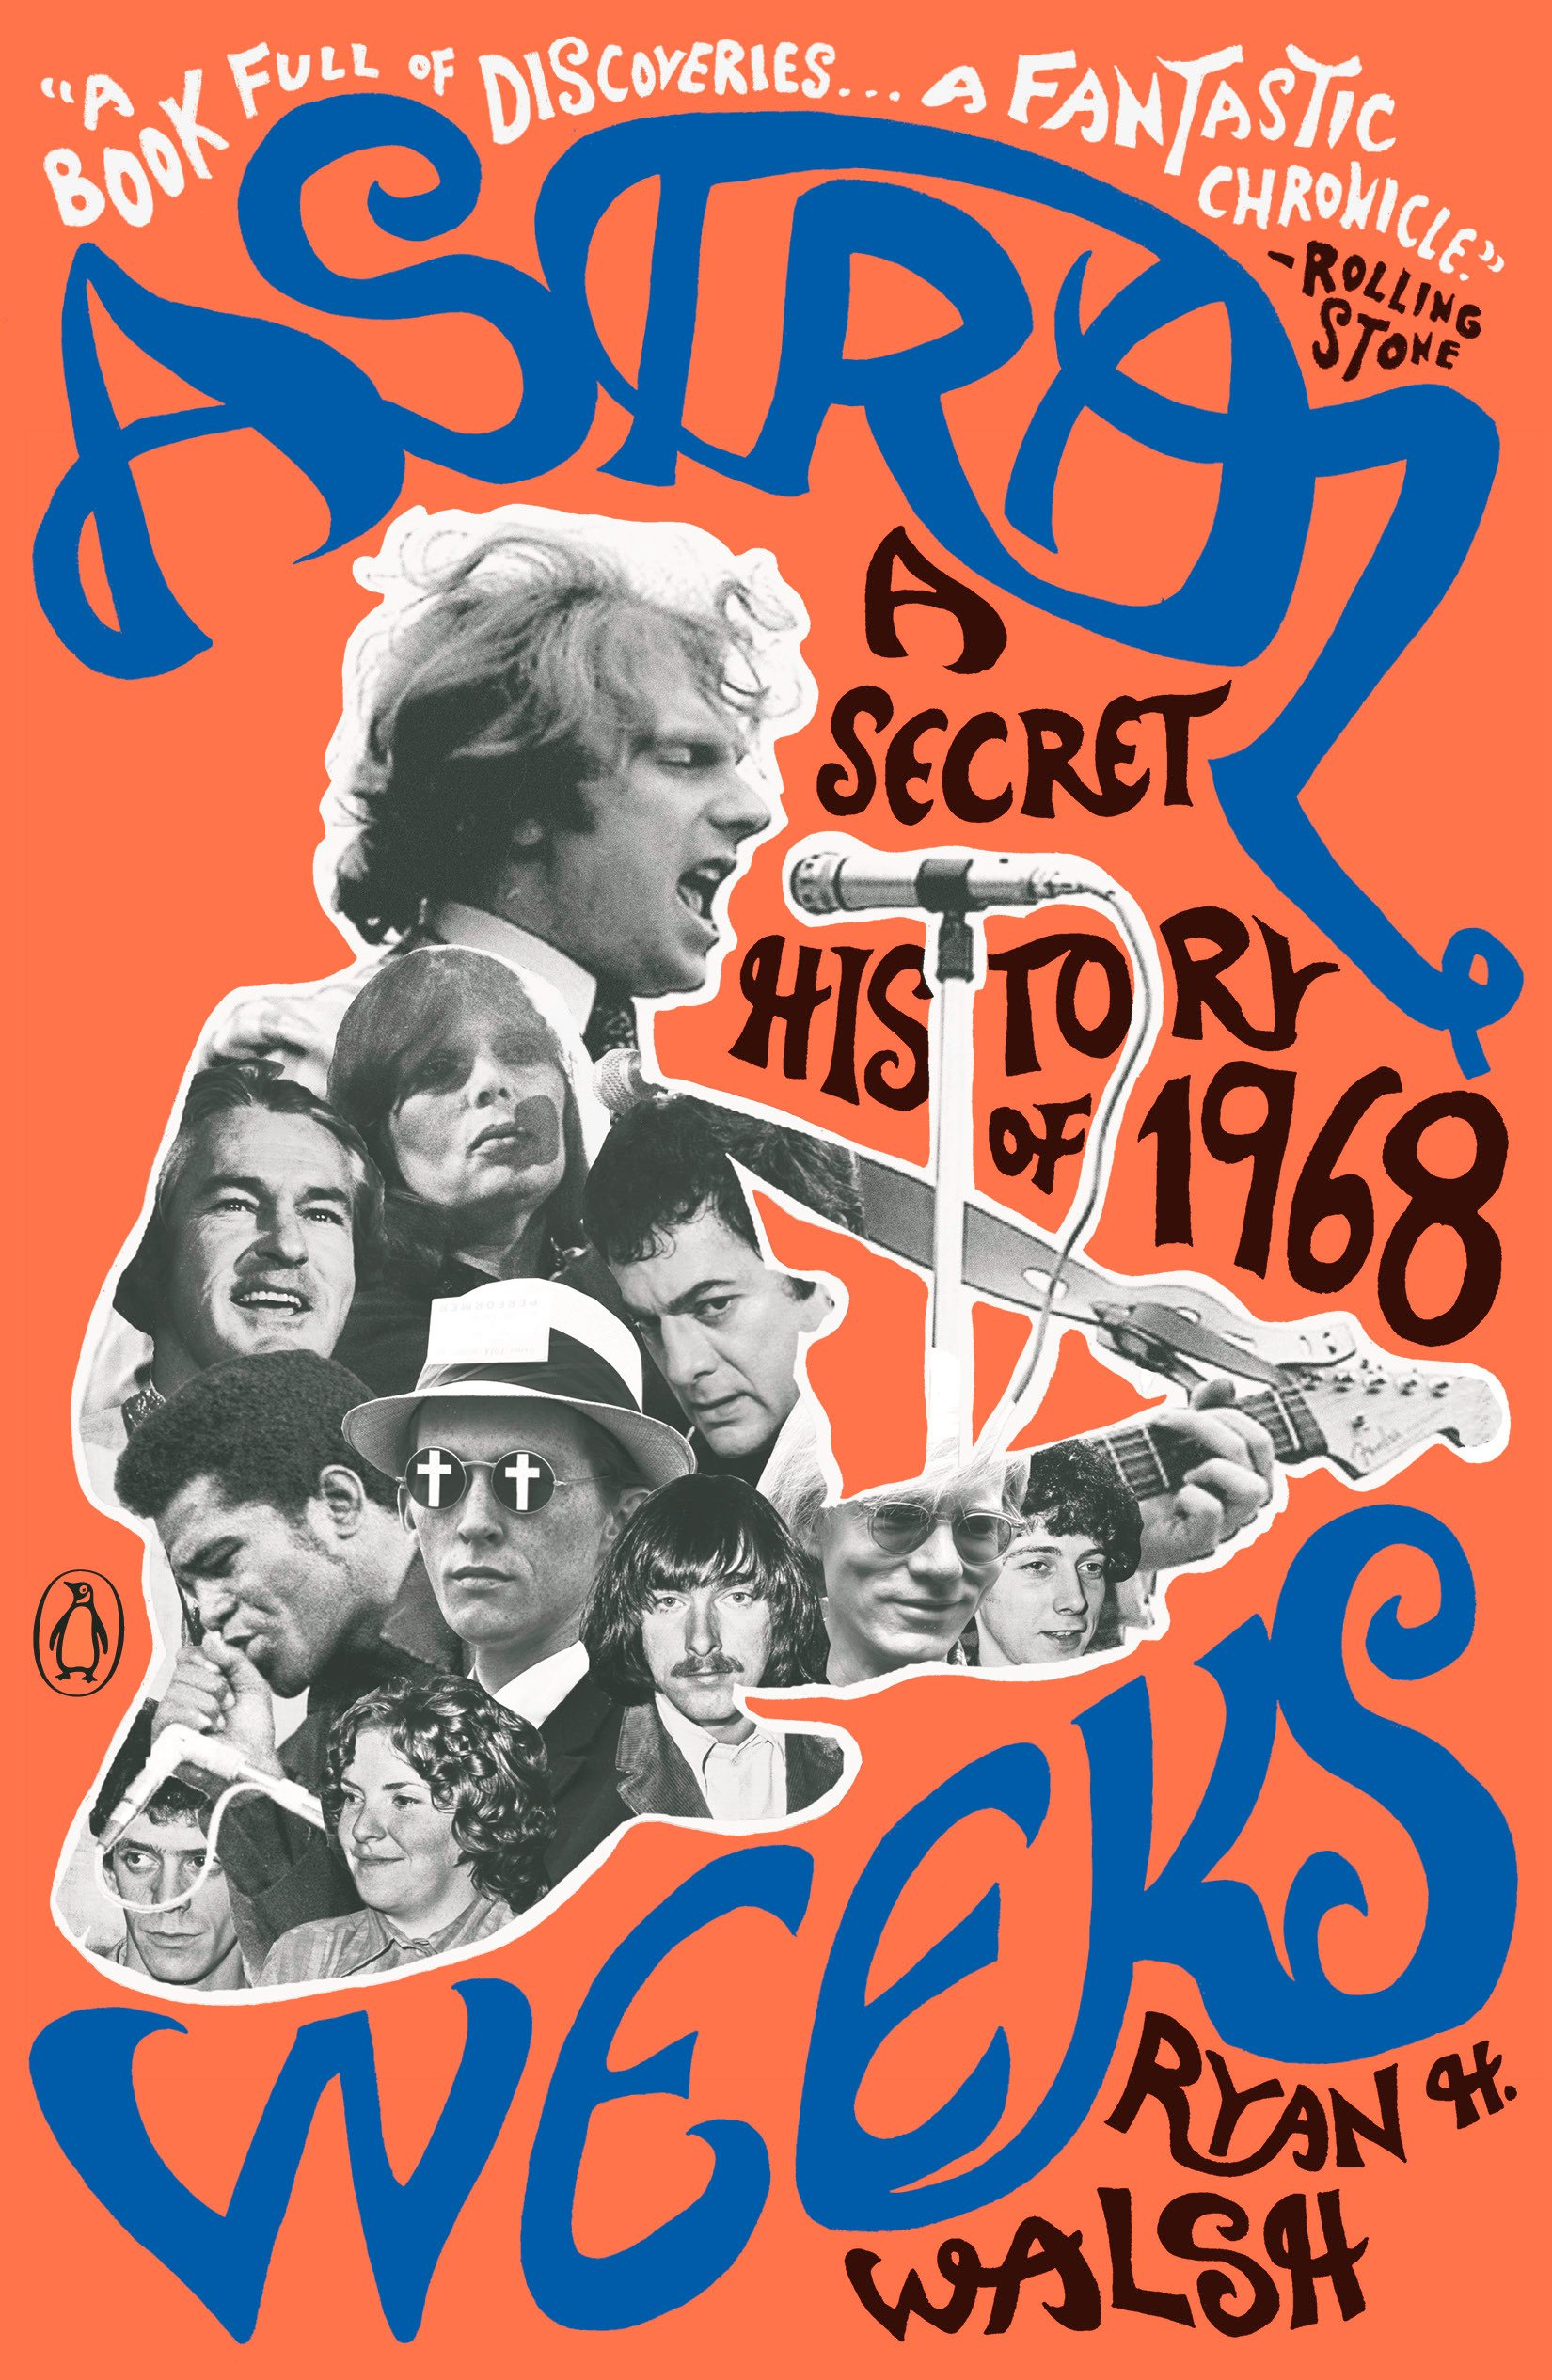 33c054dd37 Astral Weeks  A Secret History of 1968  Ryan H. Walsh  9780735221369 ...